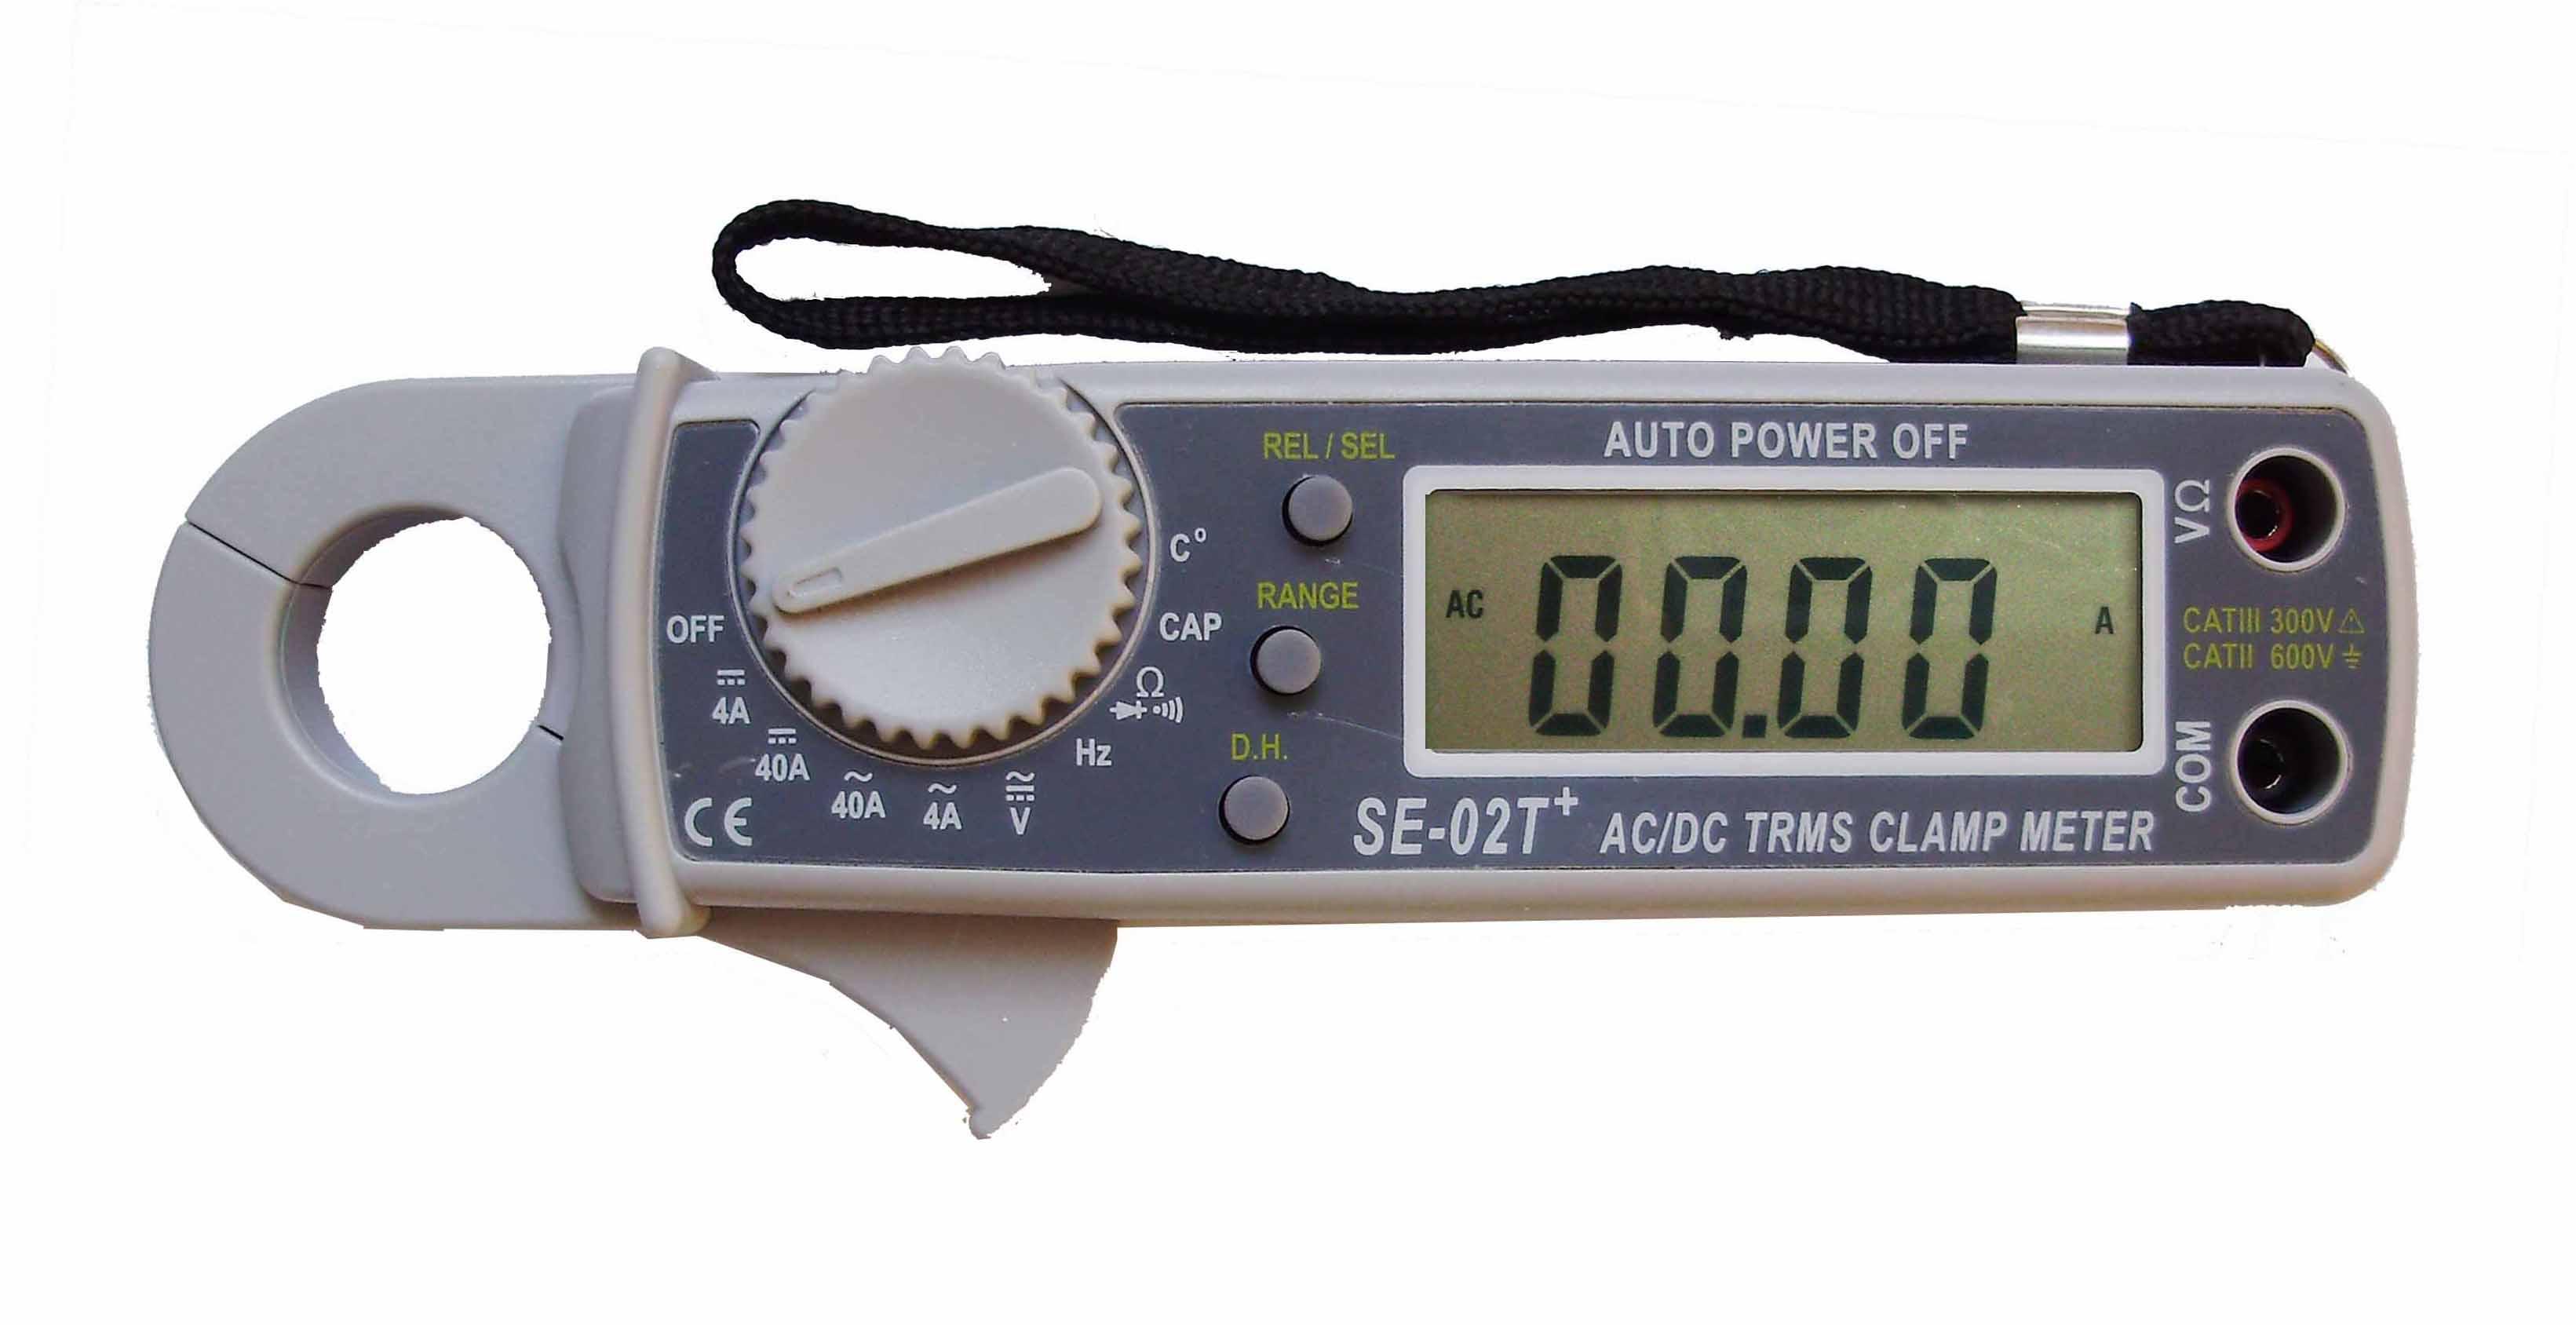 Auto Meter Clamp : Kilter electronic institute co ltd multimeter air ion